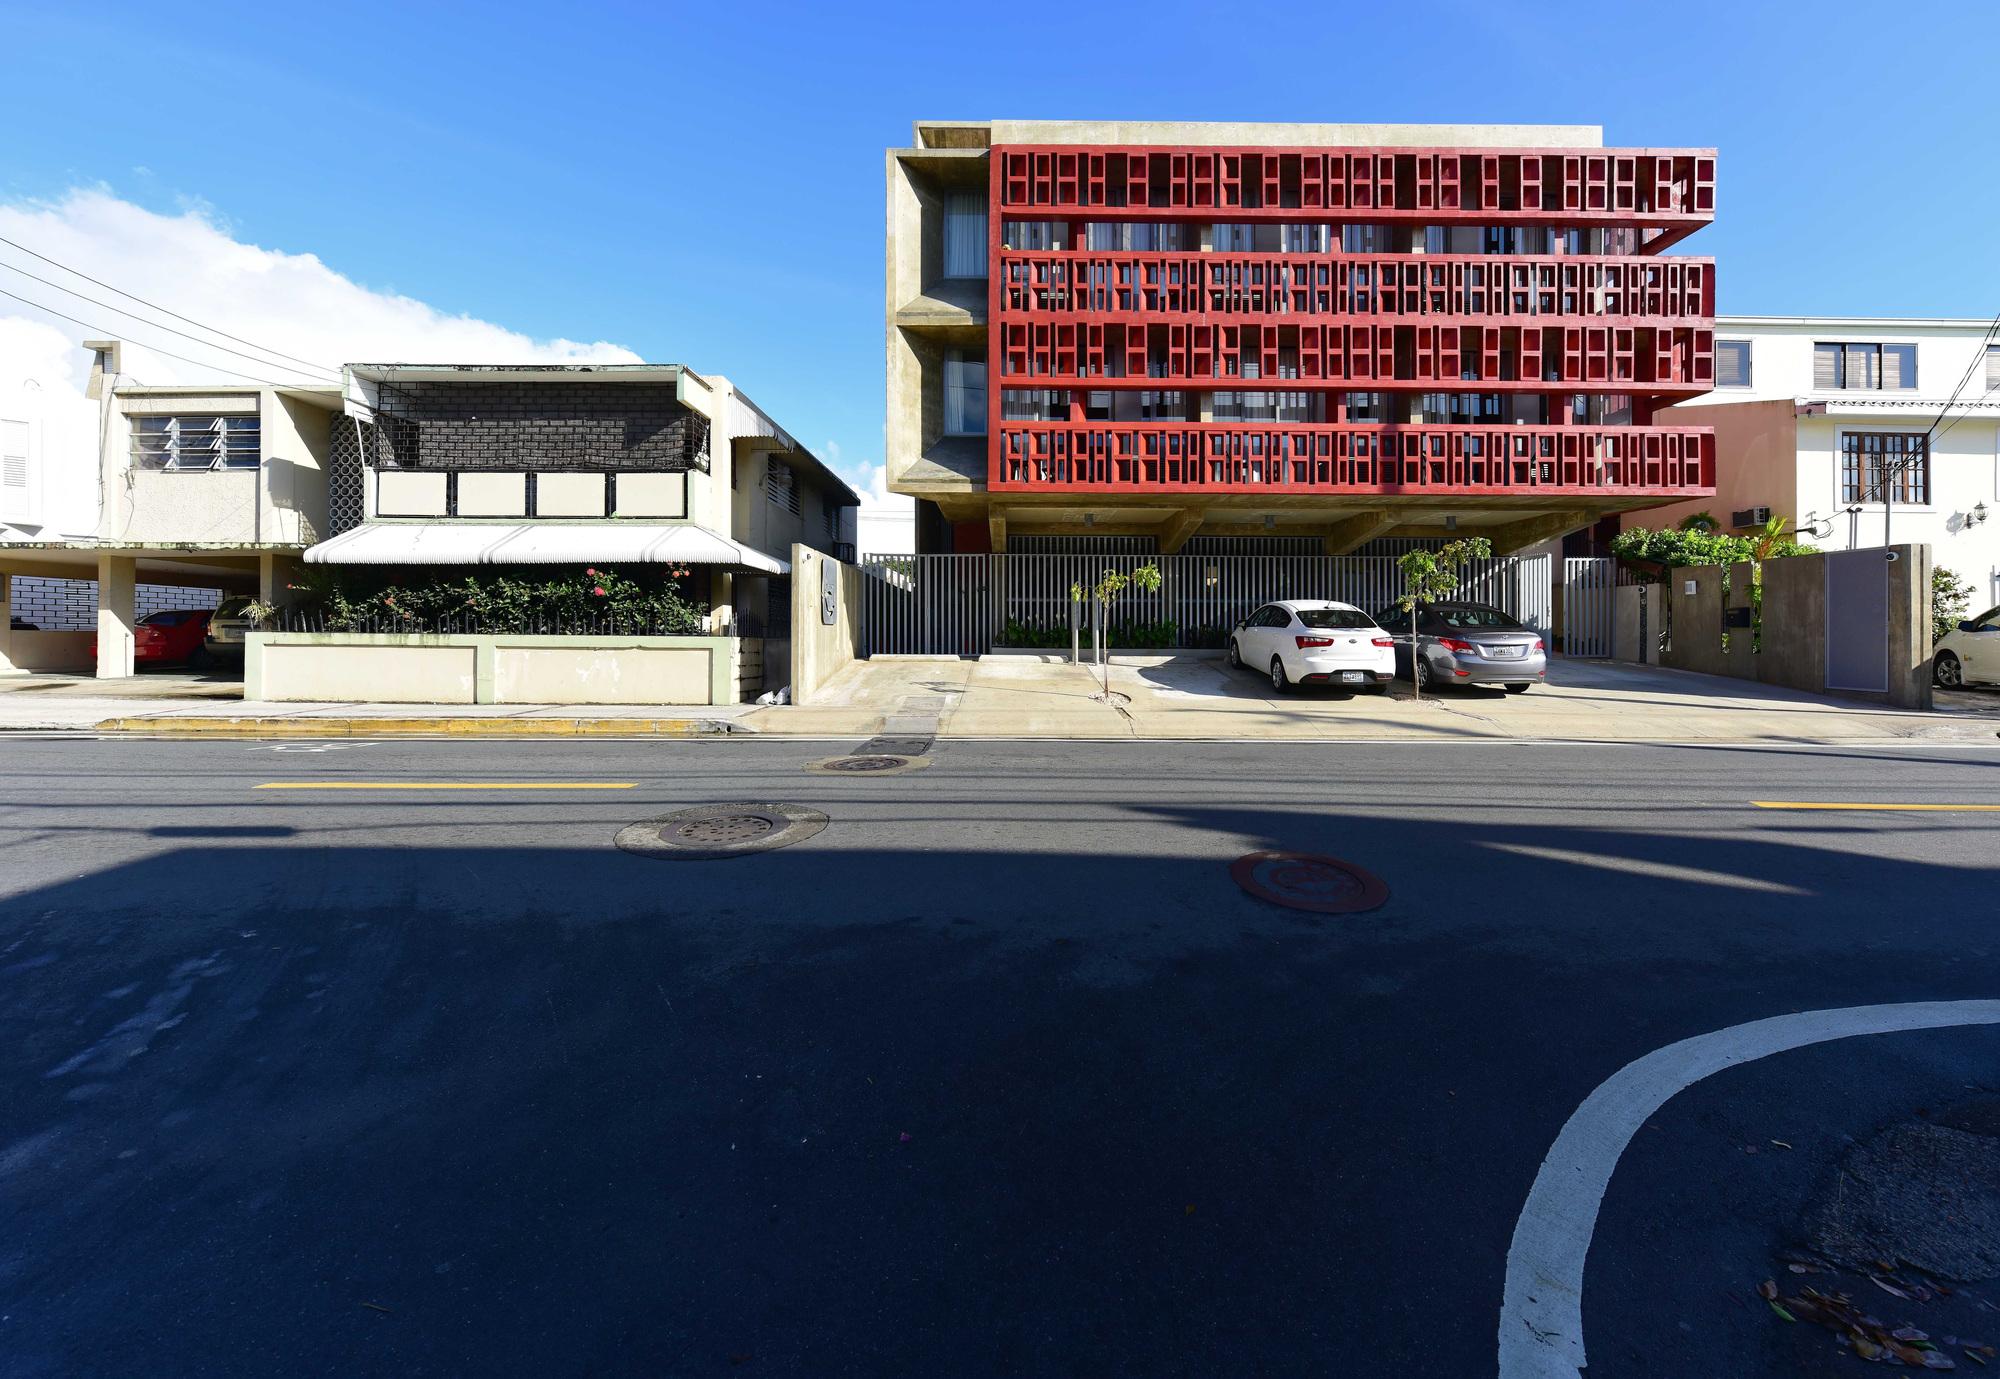 Casa Huéspedes / Coleman-Davis Pagán Arquitectos